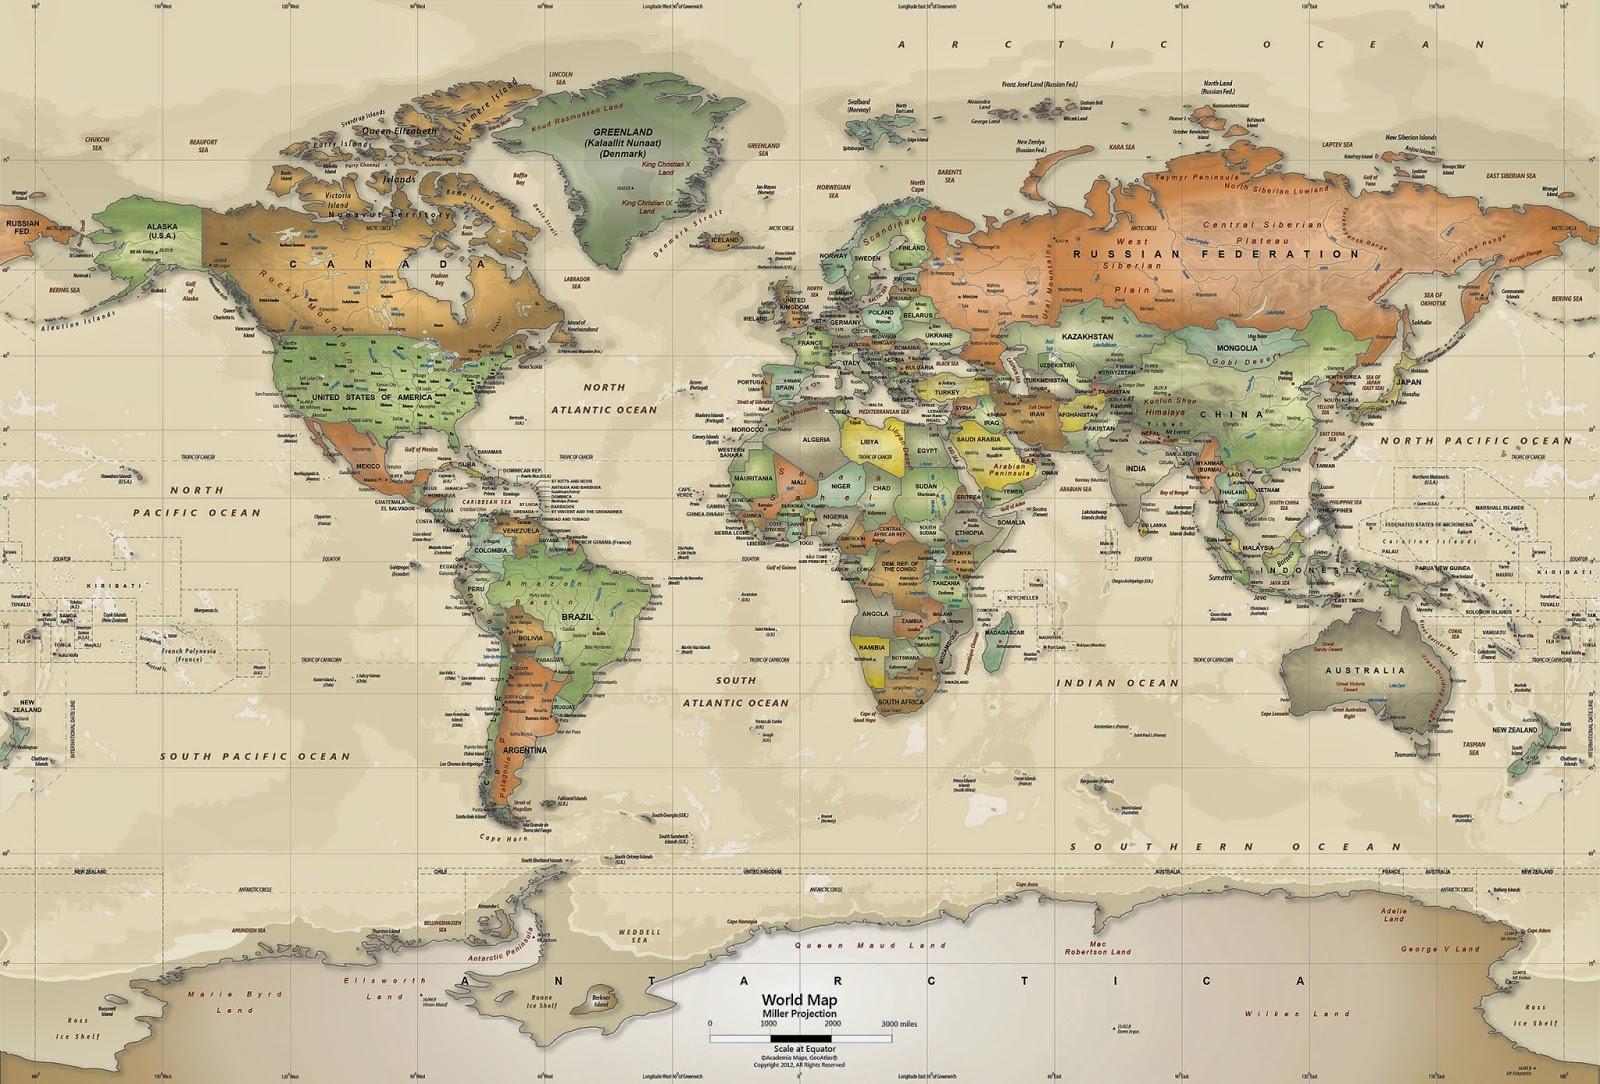 47 World Map Desktop Wallpaper Hd On Wallpapersafari